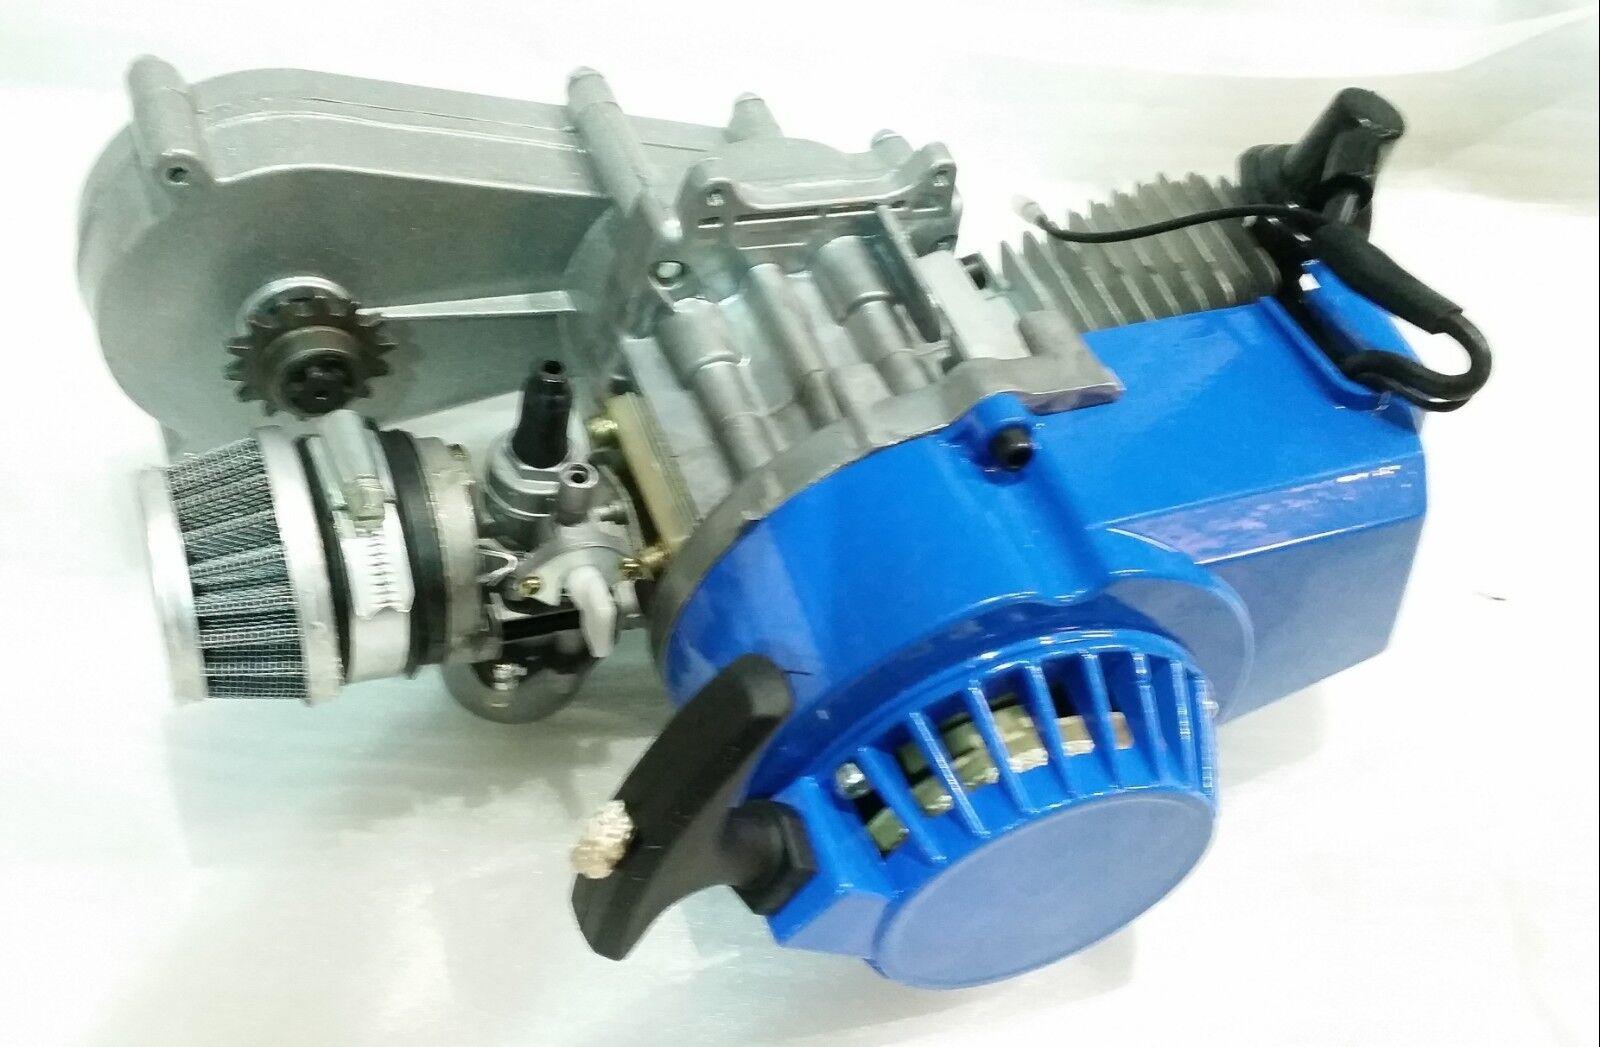 49CC MINI DIRT BIKE COMPLETE ENGINE WITH TRANSFER BOX blueE PULL START MINI MOTO